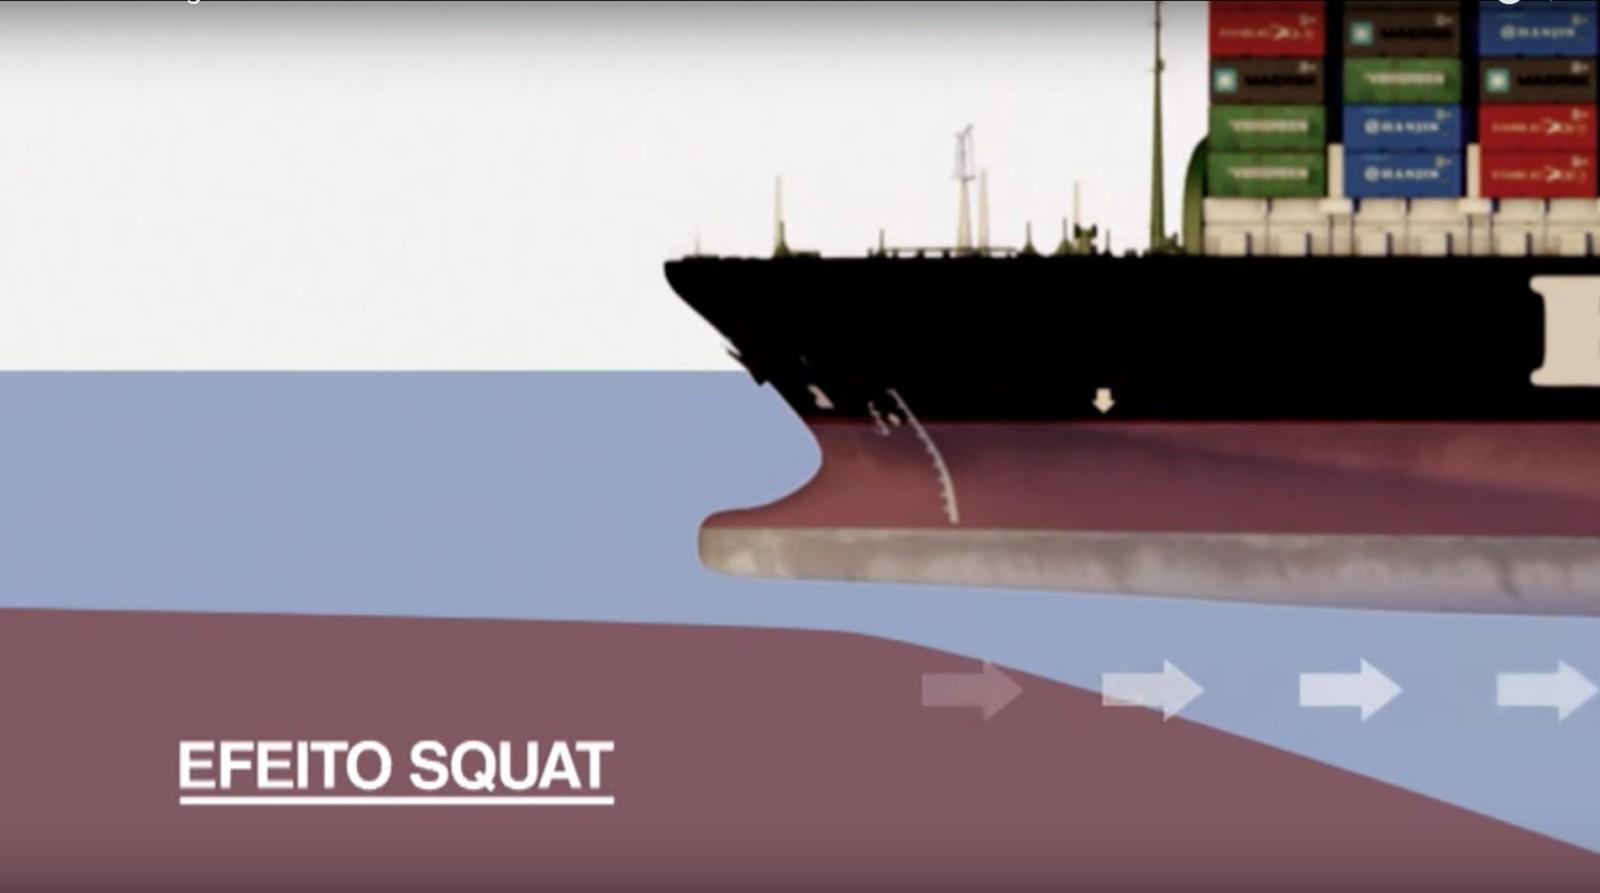 efeito squat